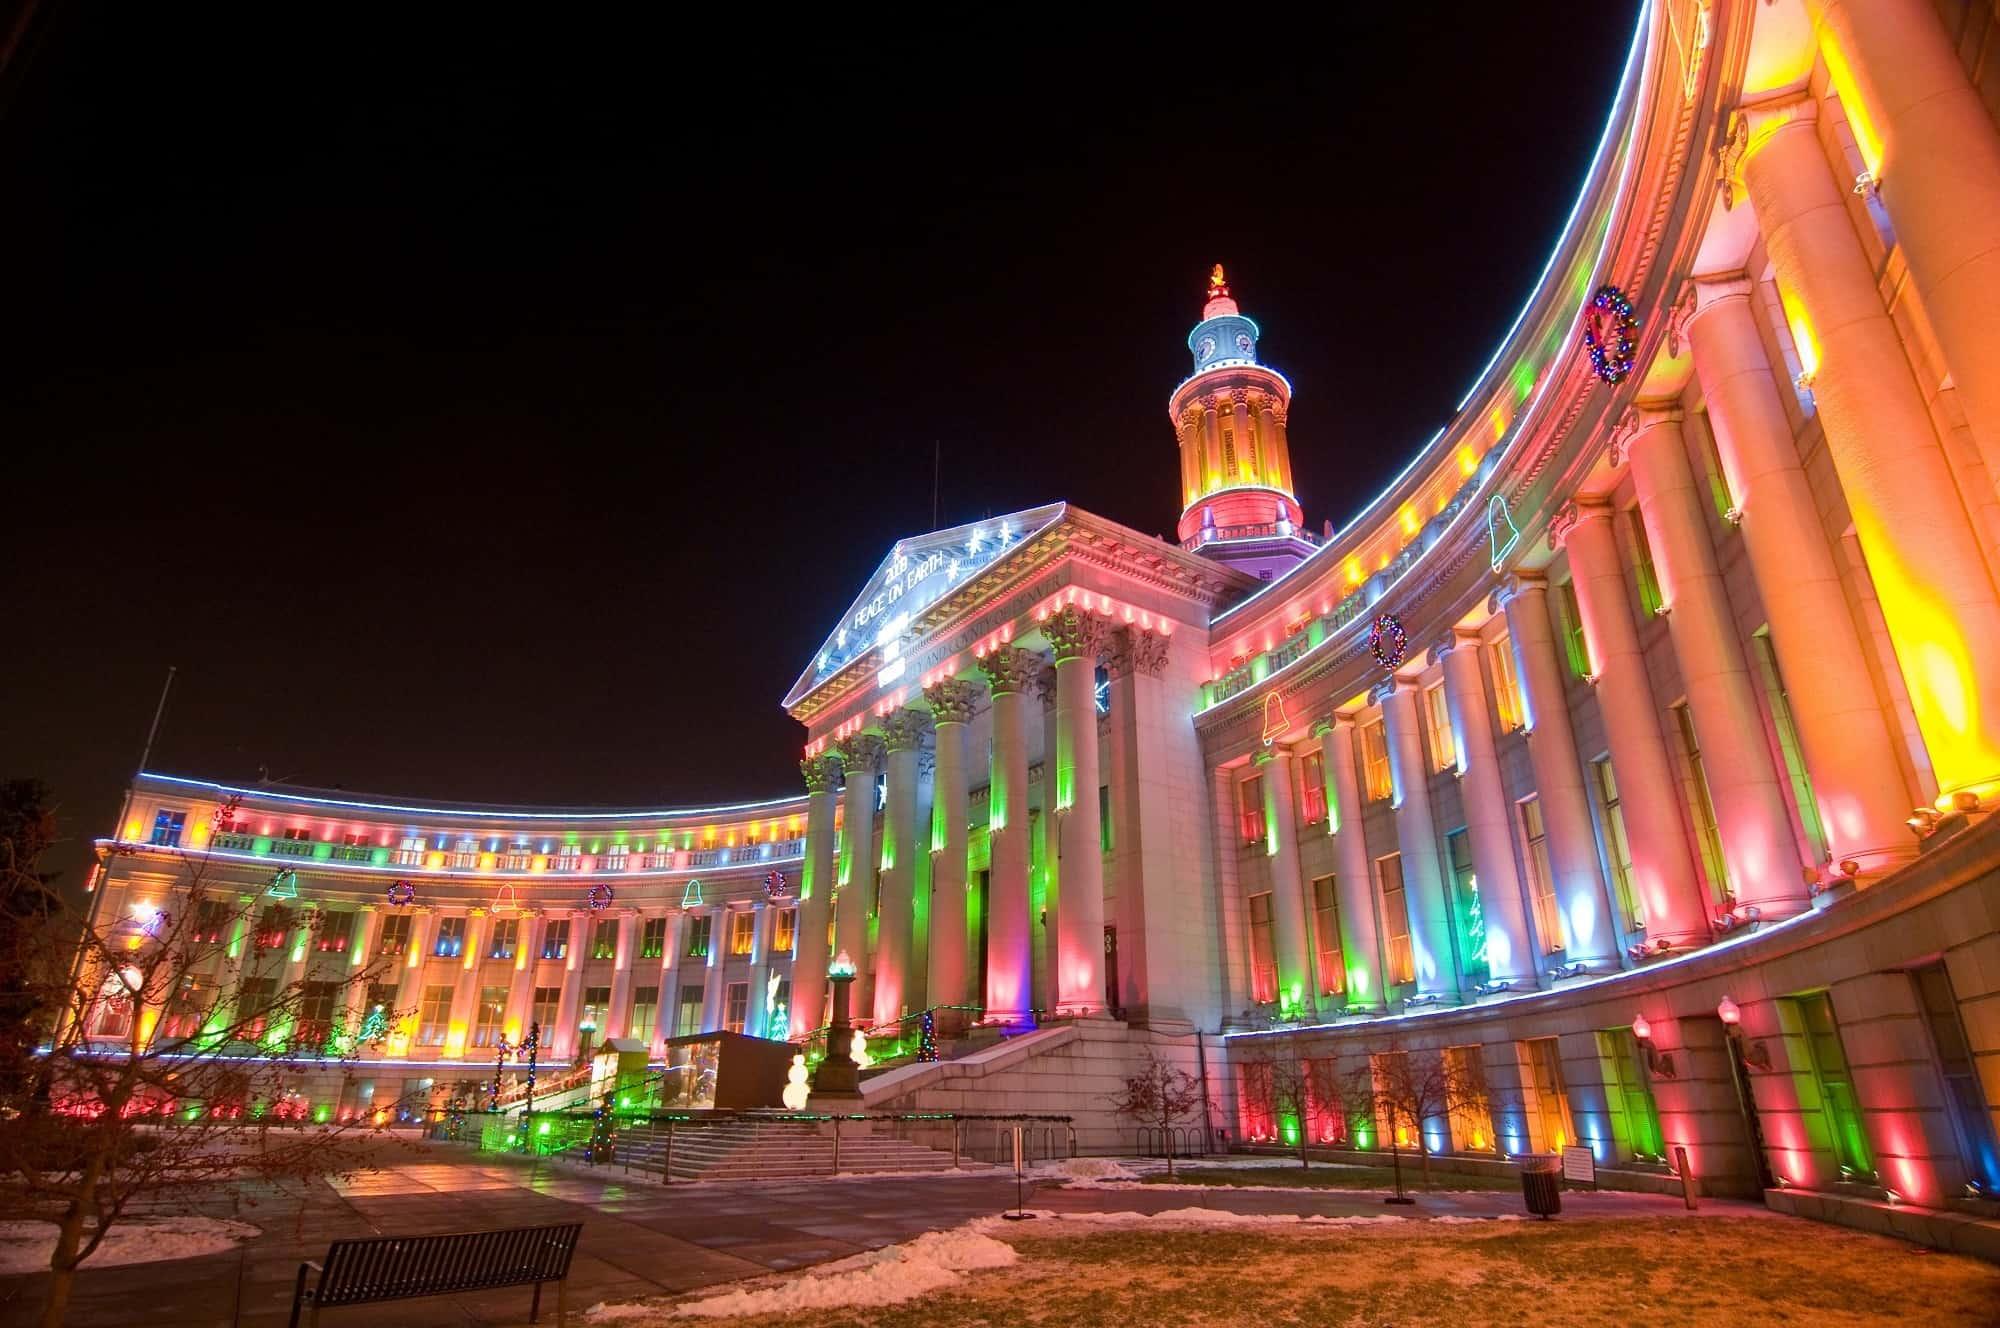 Christmas in Denver | The Best Denver Christmas Events for Families